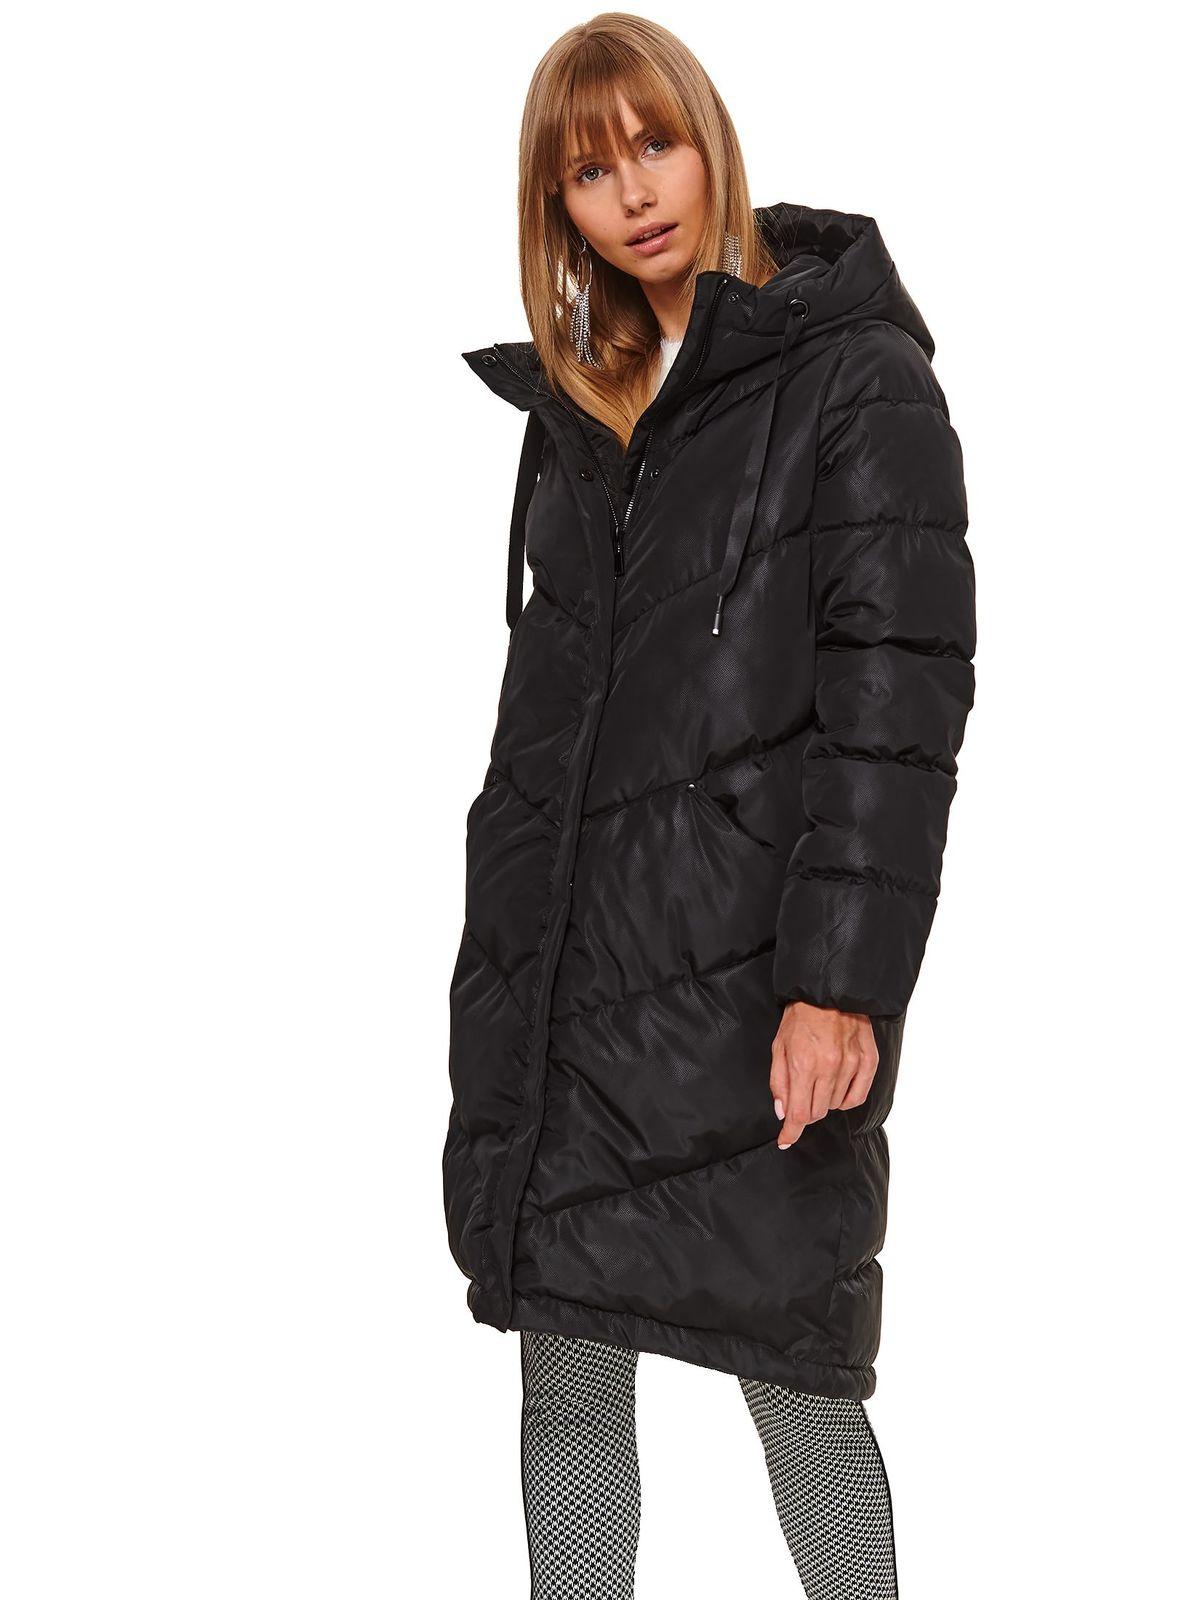 Black jacket long from slicker casual